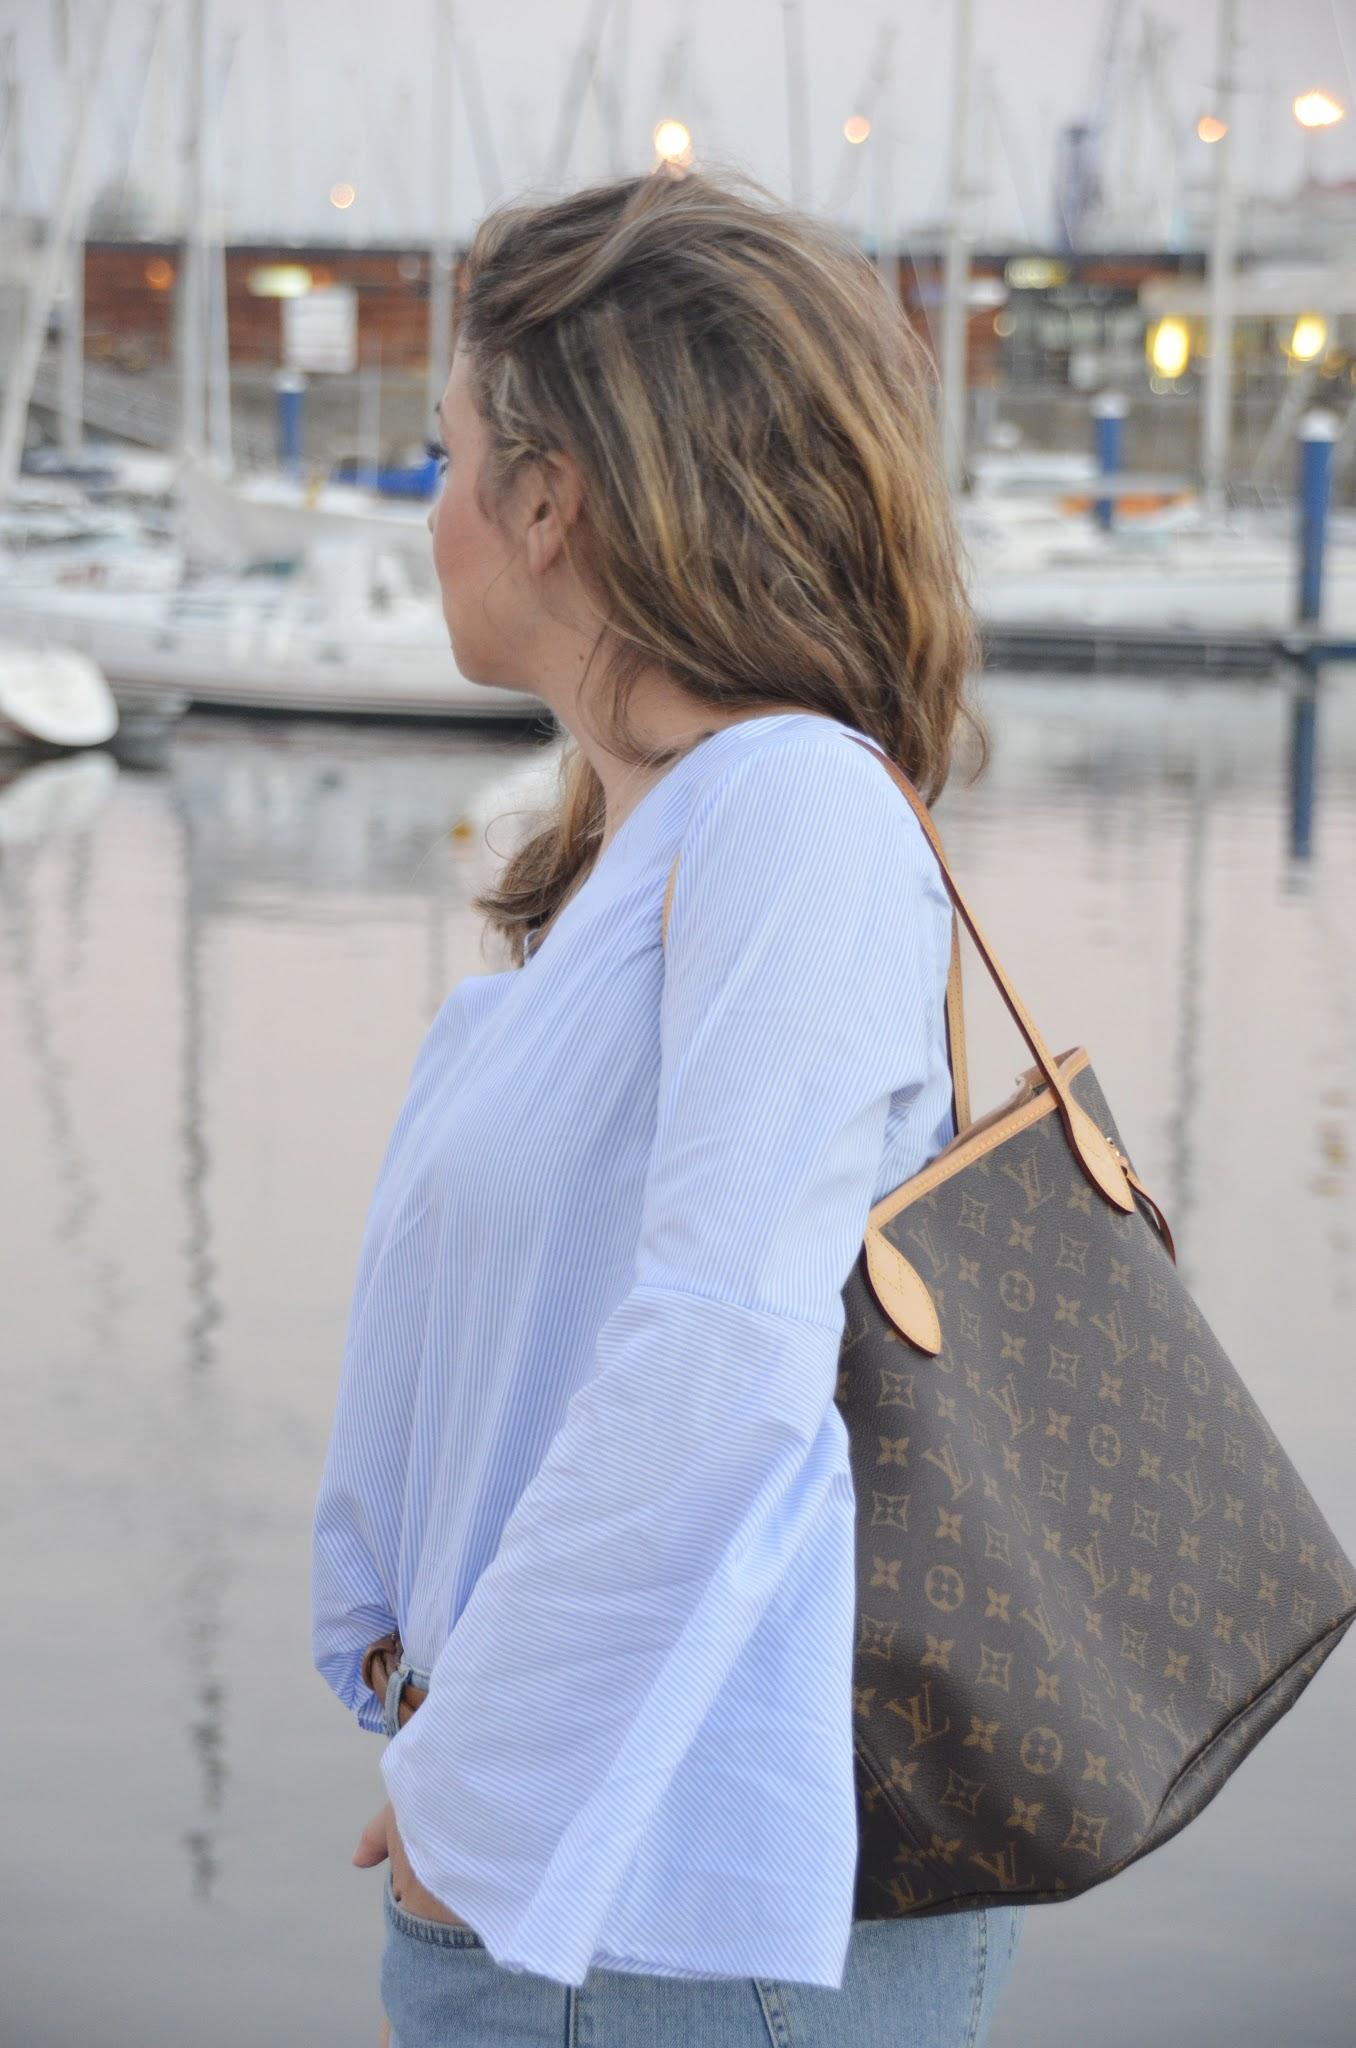 louisvuitton-neverfull-mm-fashionblogger